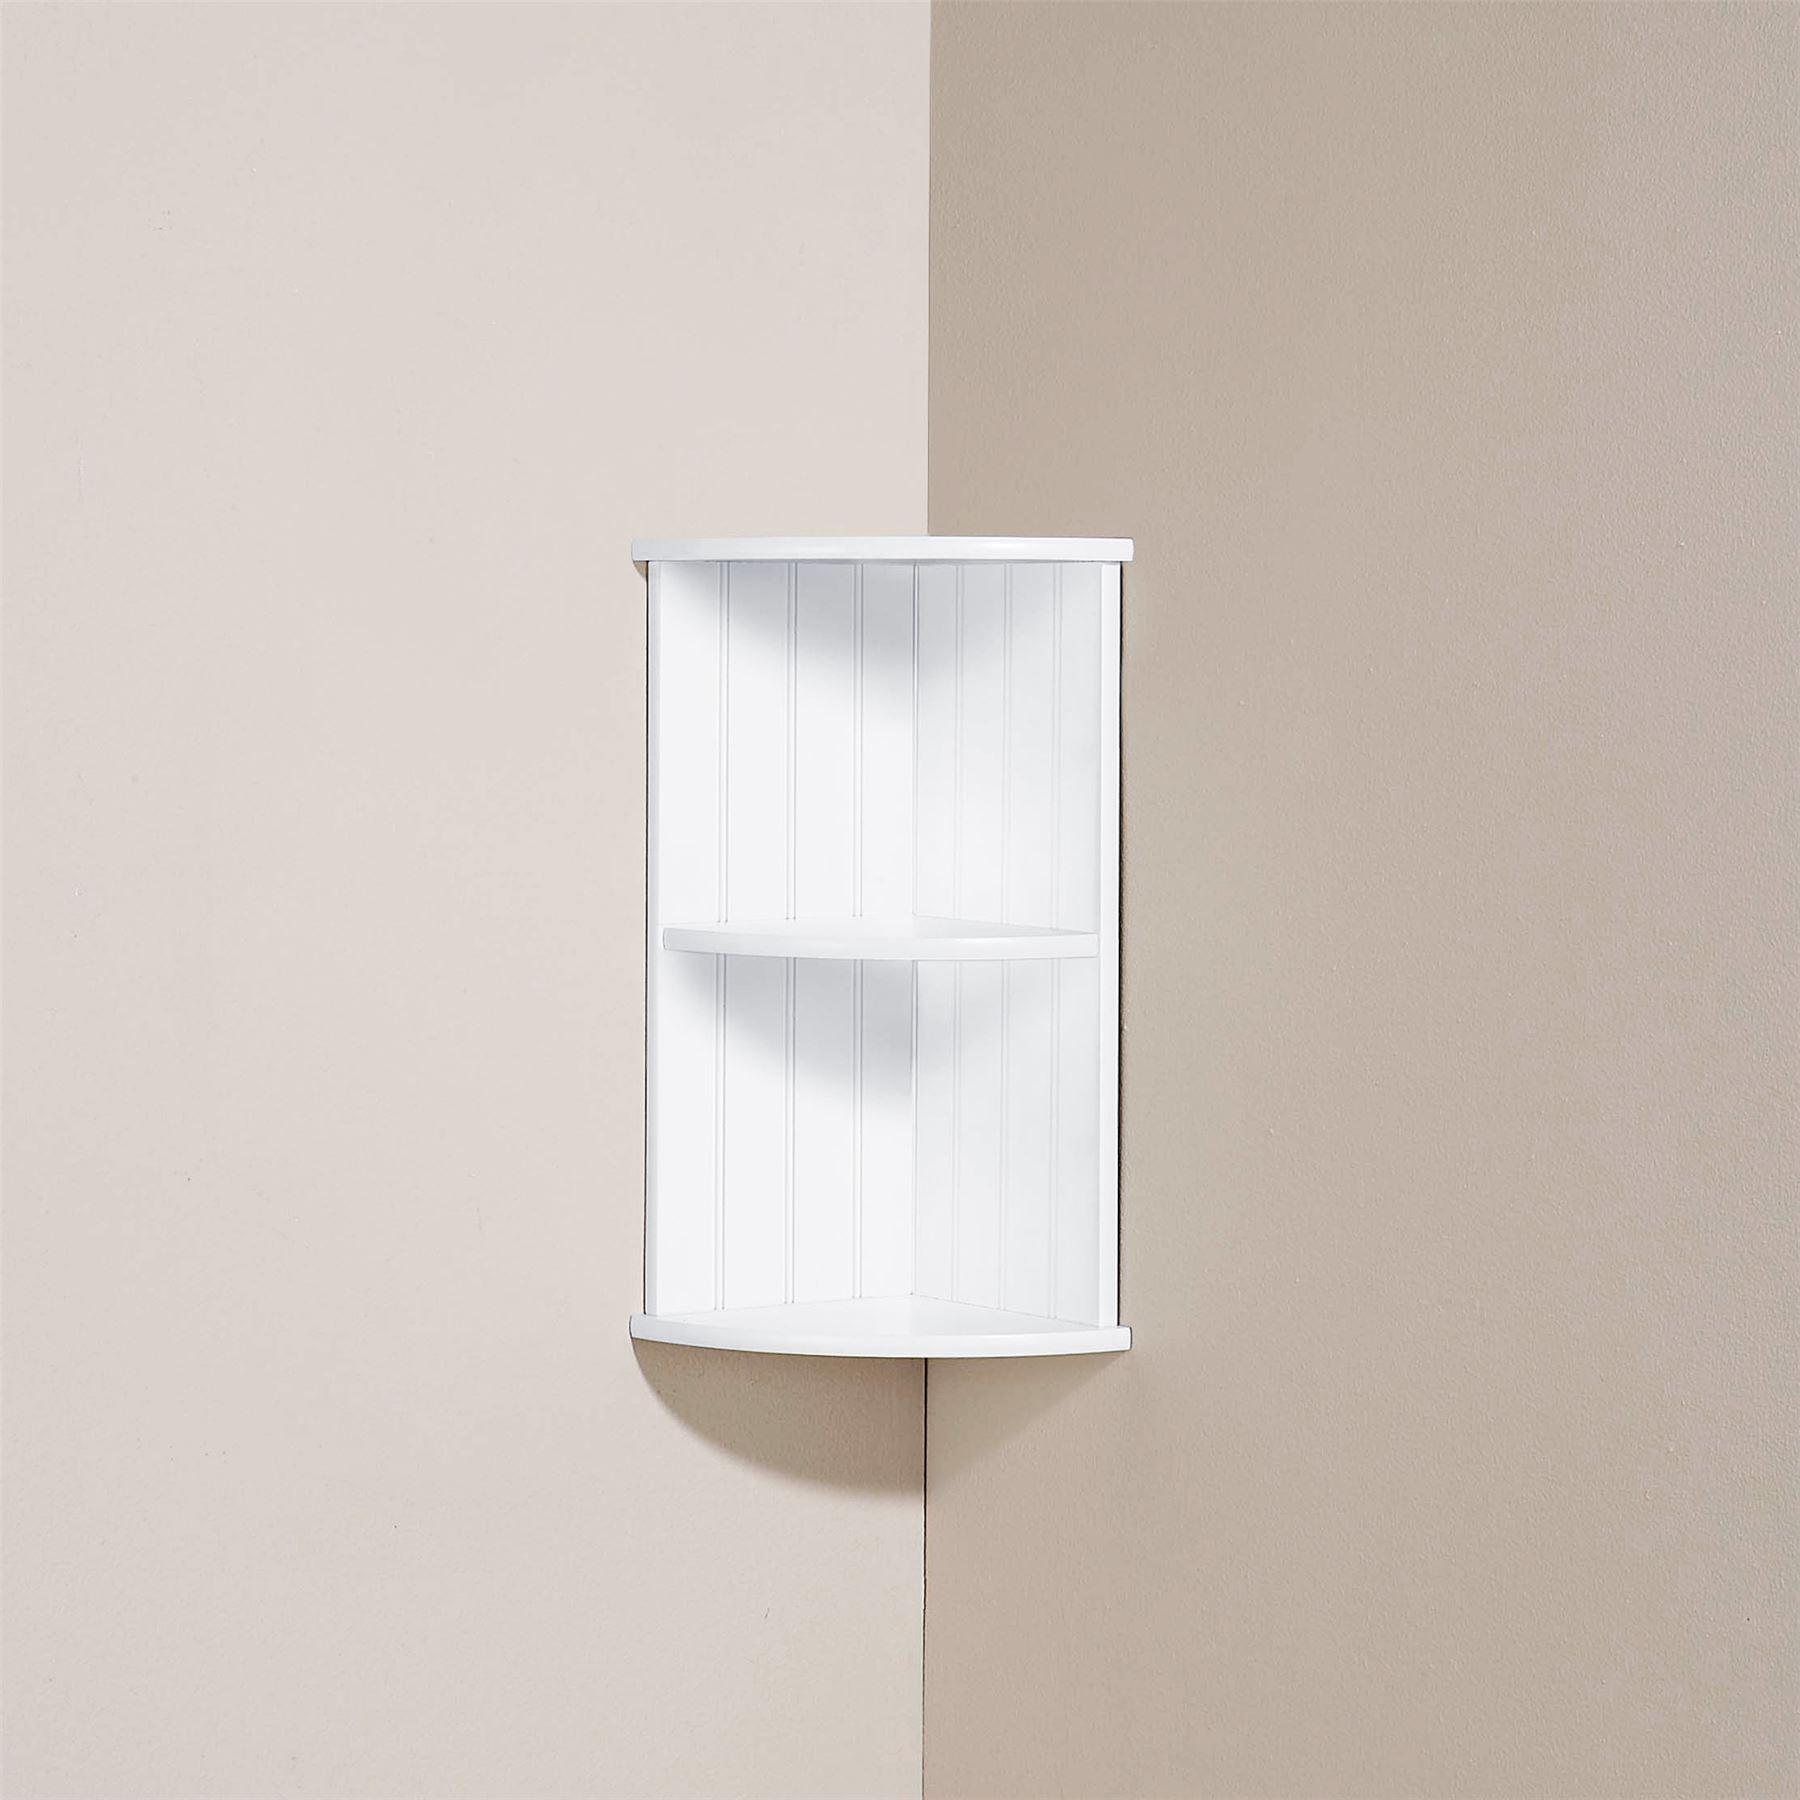 Colonial Range Bathroom Corner Wall Shelf Unit Cupboard Cabinet Storage White Ebay